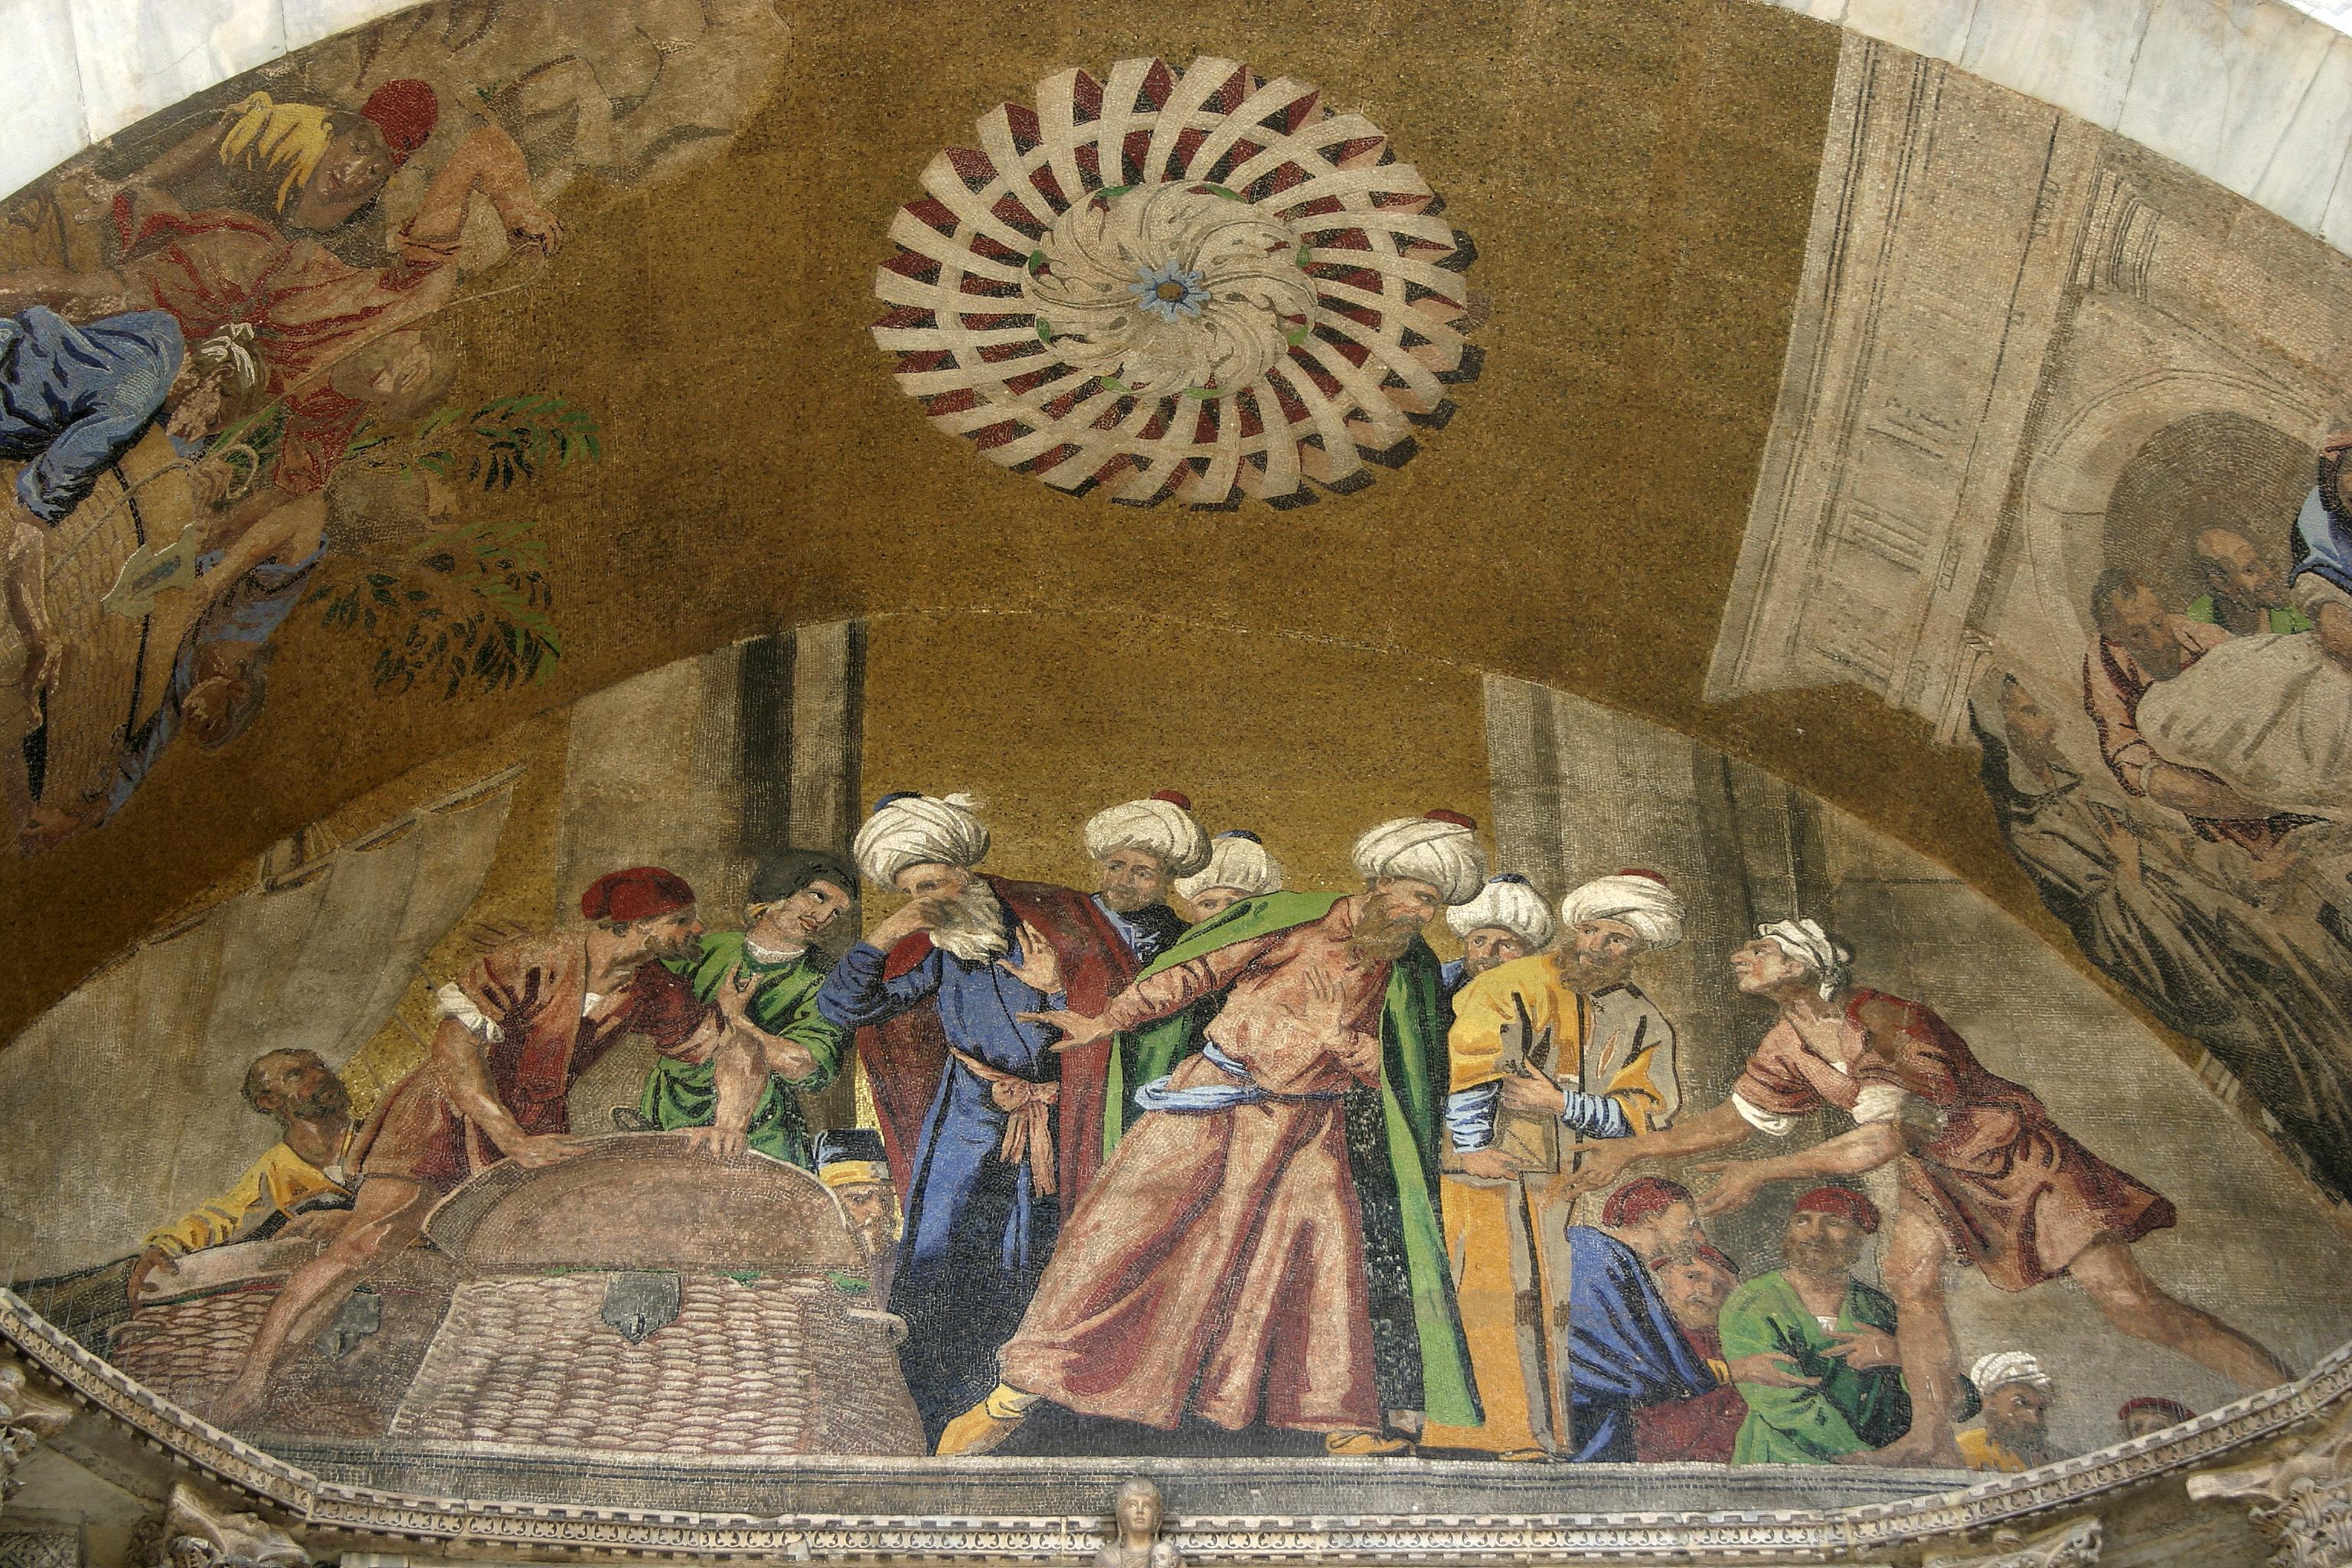 Il fontego dei turchi storia e arte veneta for Veneta arredi alessandria